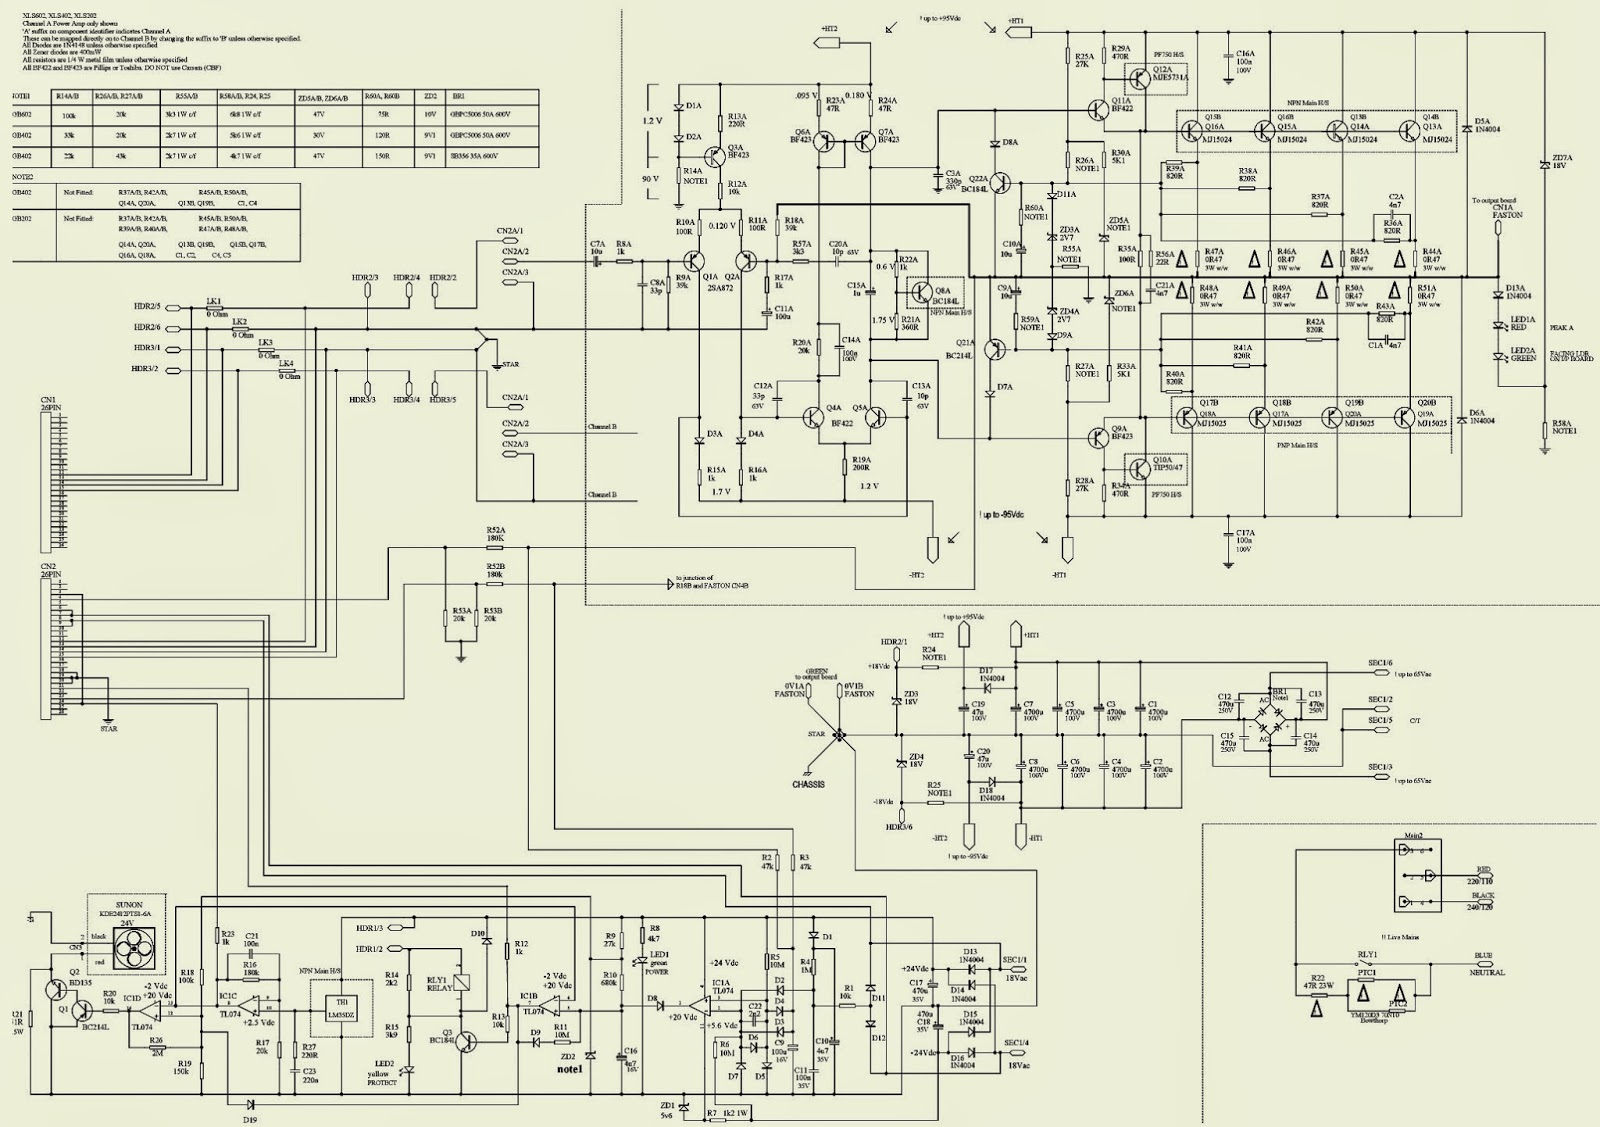 crown xls602 xls402 xls202 amp schematic circuit diagram  [ 1600 x 1127 Pixel ]